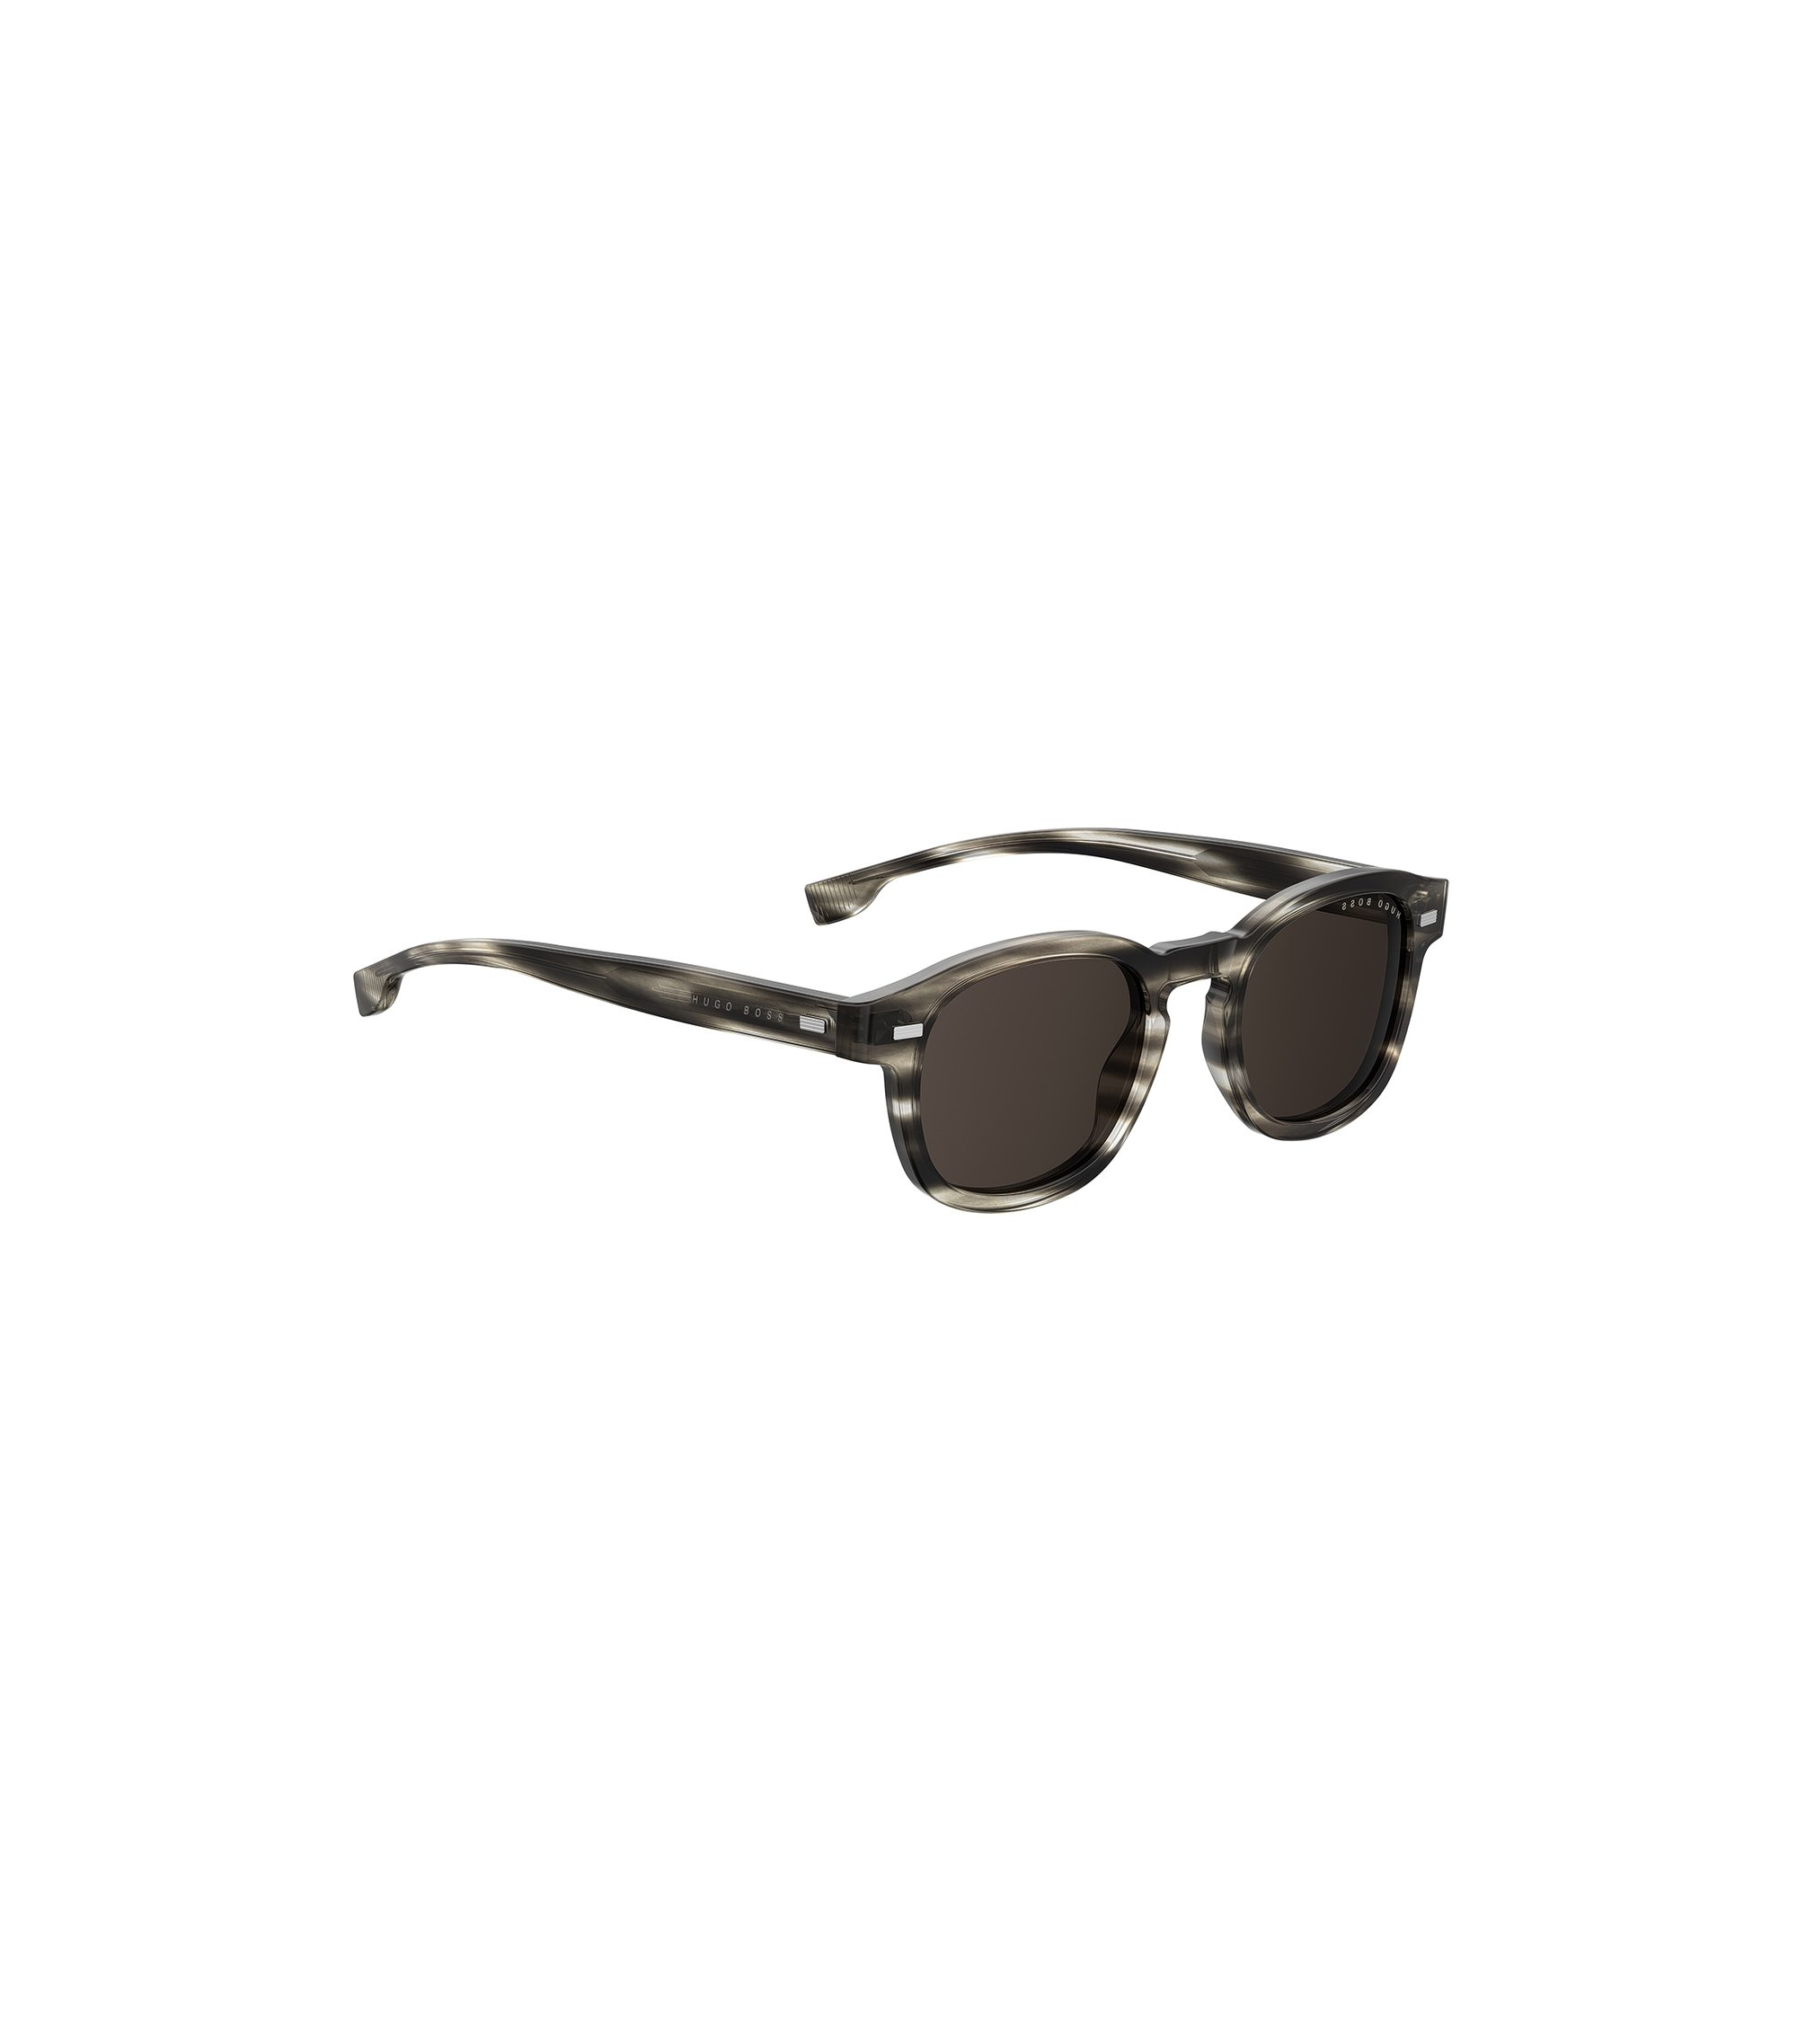 Keyhole-nose sunglasses in monochrome Havana acetate, Patterned